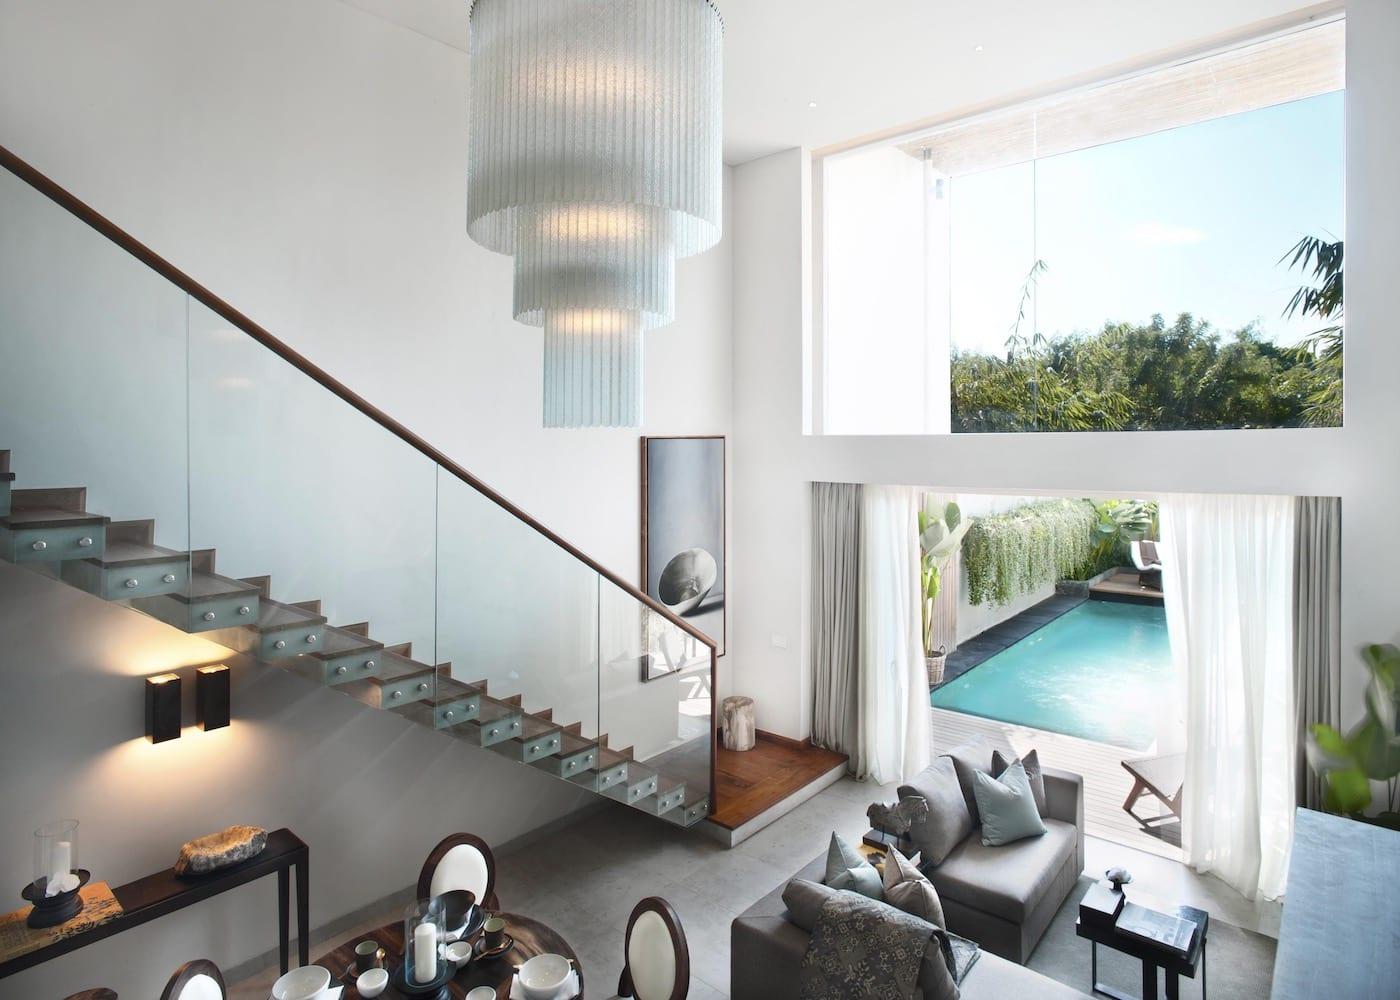 Inside Hu'u Villas - one of the best villa resorts in Seminyak, Bali, Indonesia